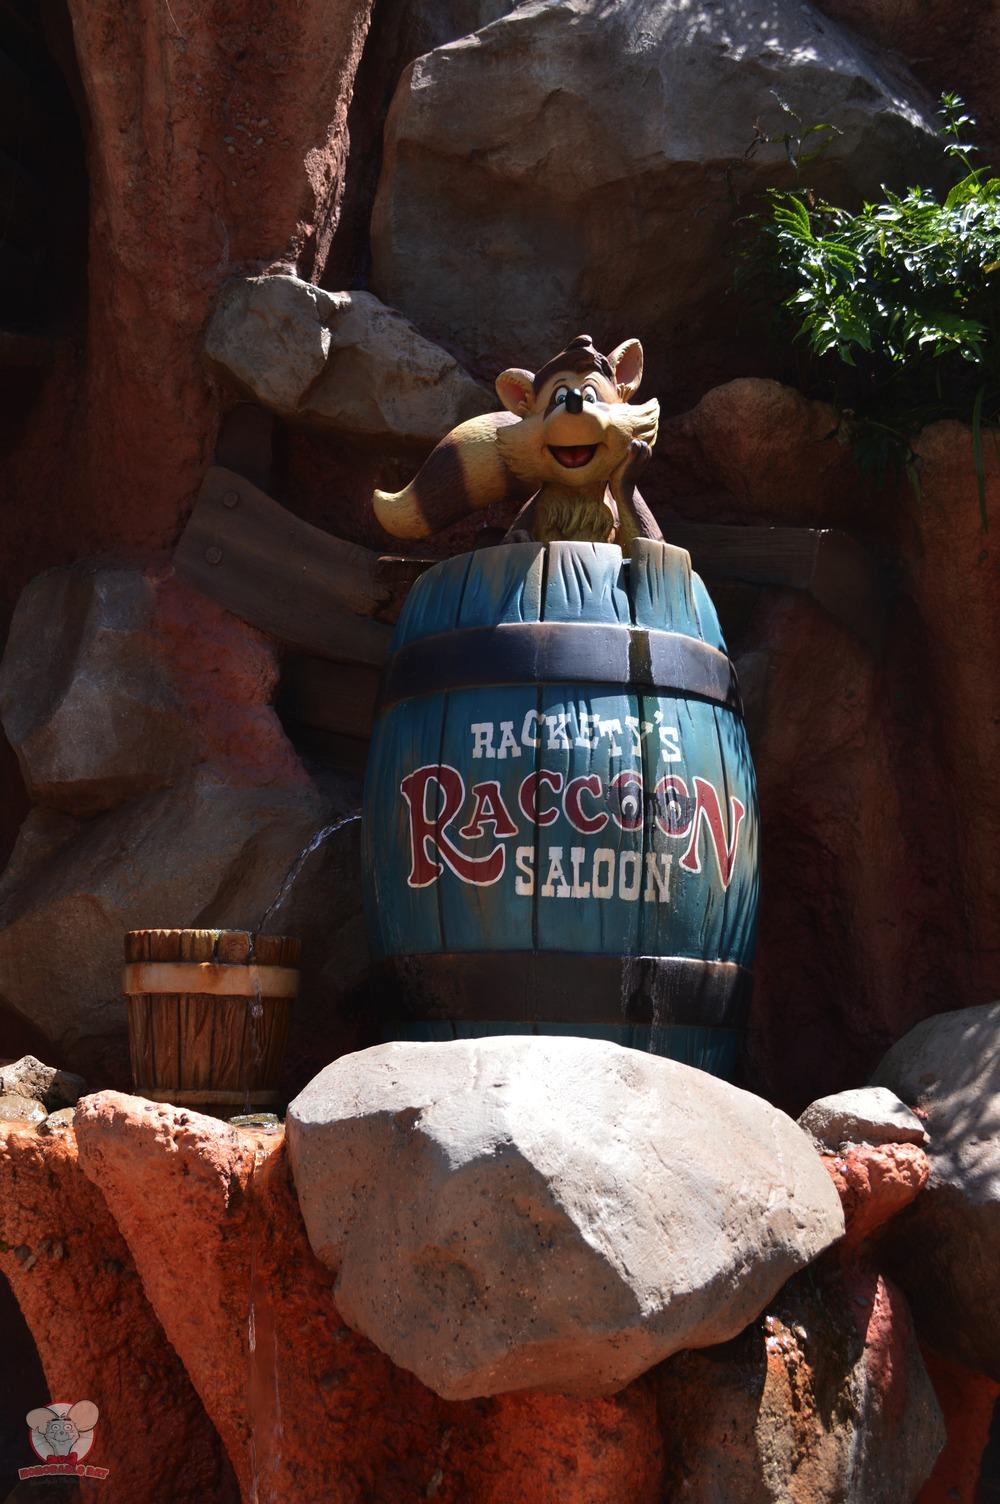 Rackety Raccoon hiding in a barrel